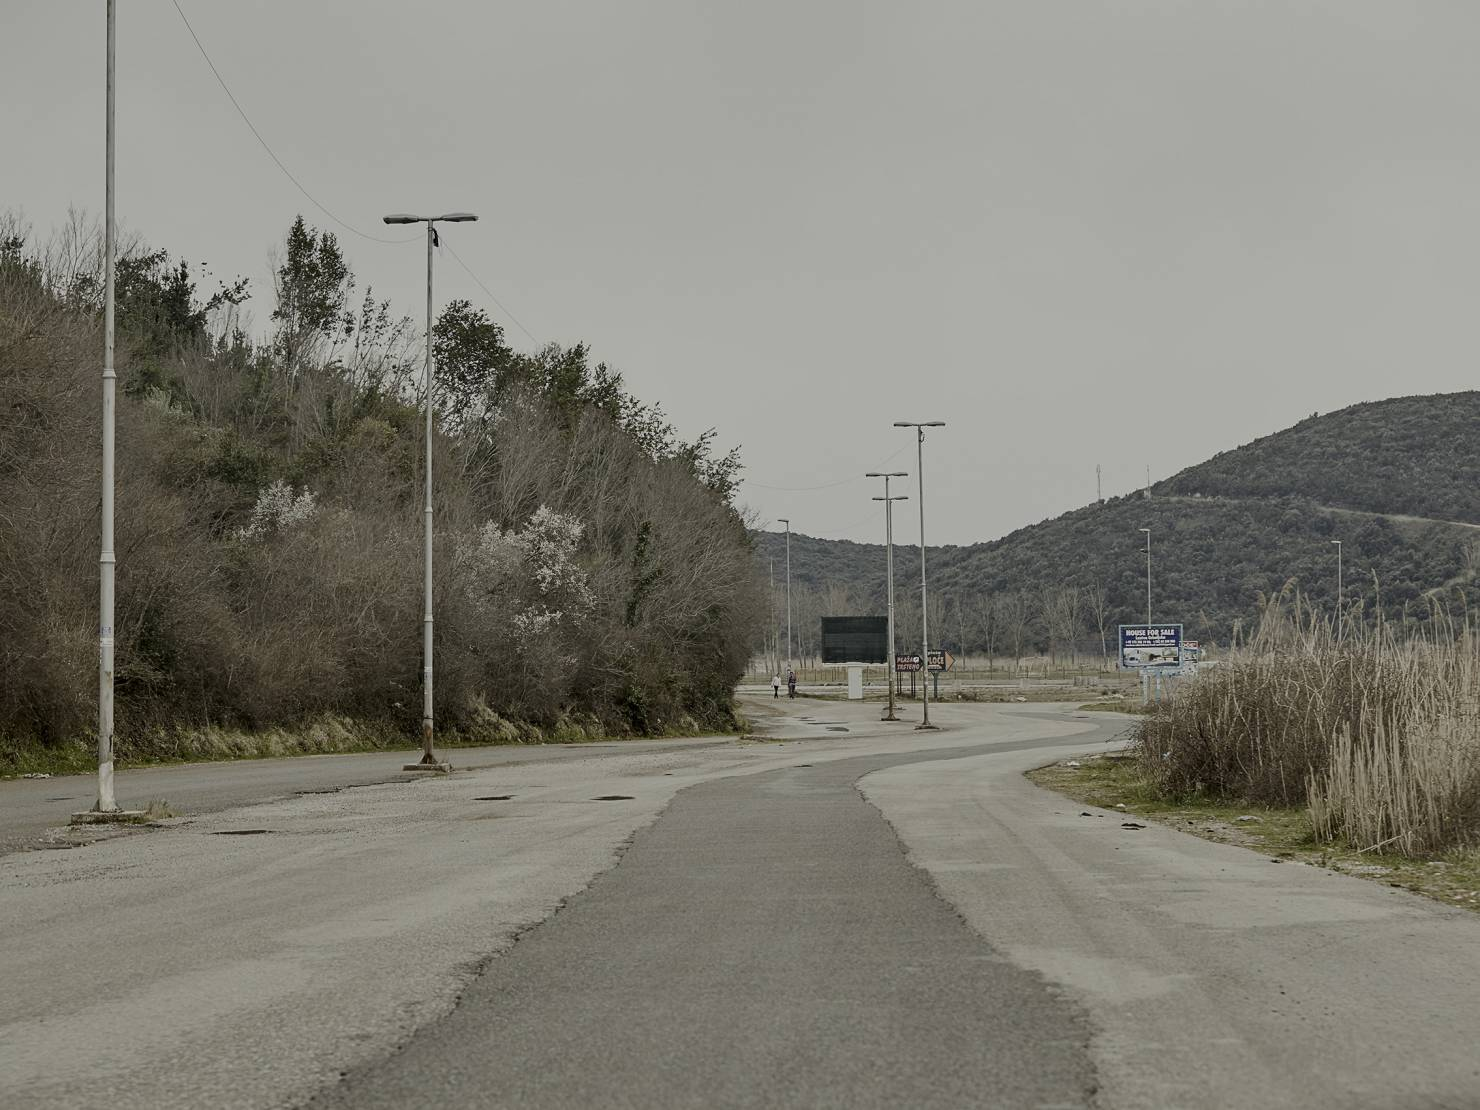 montenegro_001_patrick_schuttler-e94e654d4ce265a6edd946c201905a29